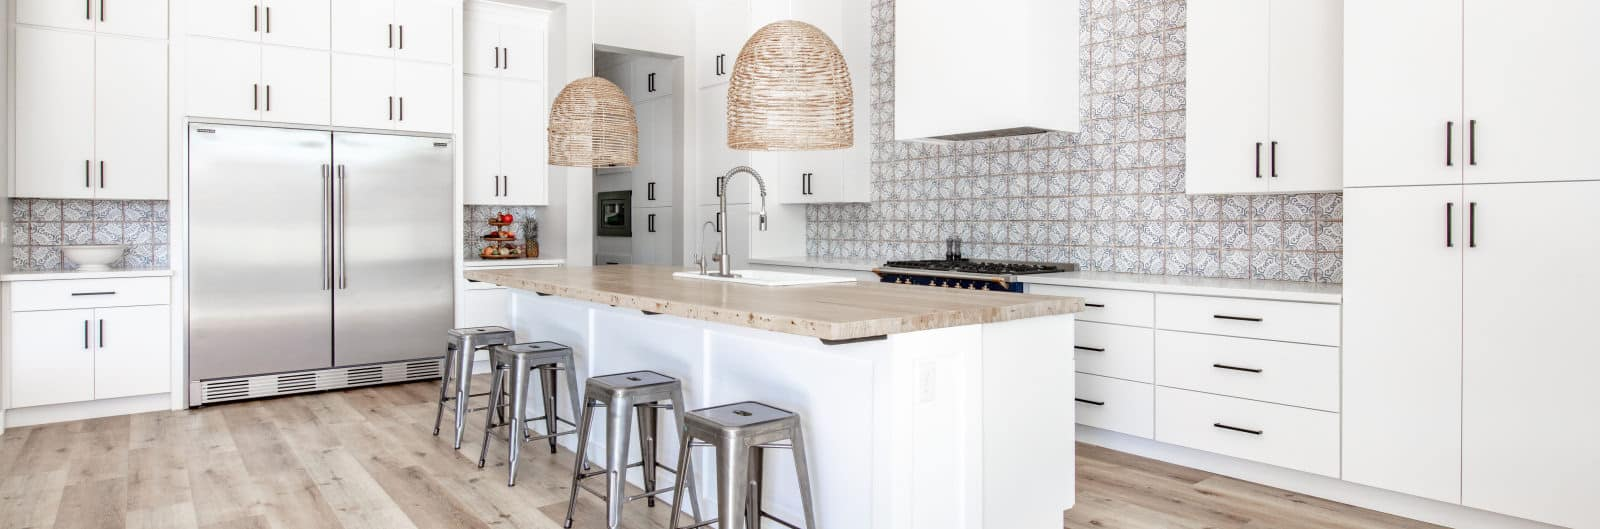 #1 Kitchen Cabinets In Glendale   Madera Interior Solutios